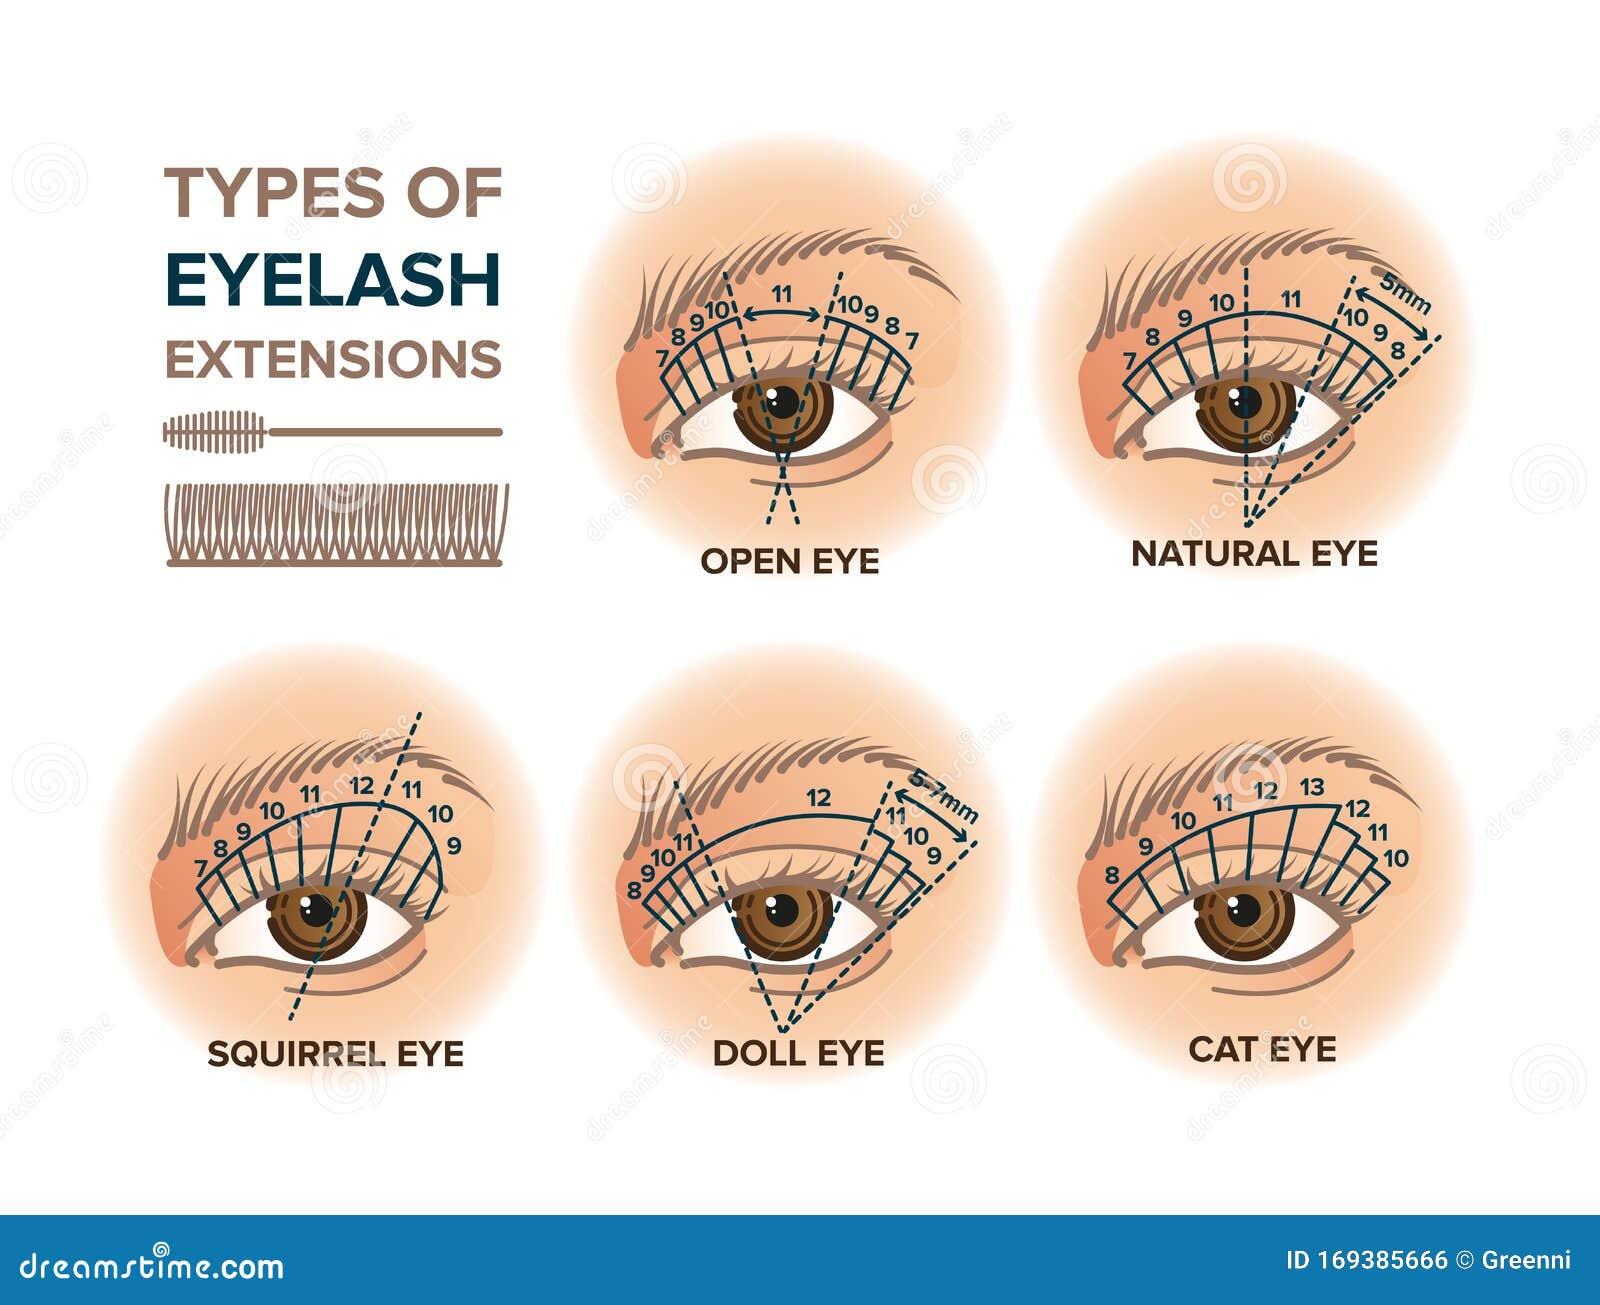 Types Of Eyelash Extensions Illustration Stock Vector Illustration Of Extension Salon 169385666